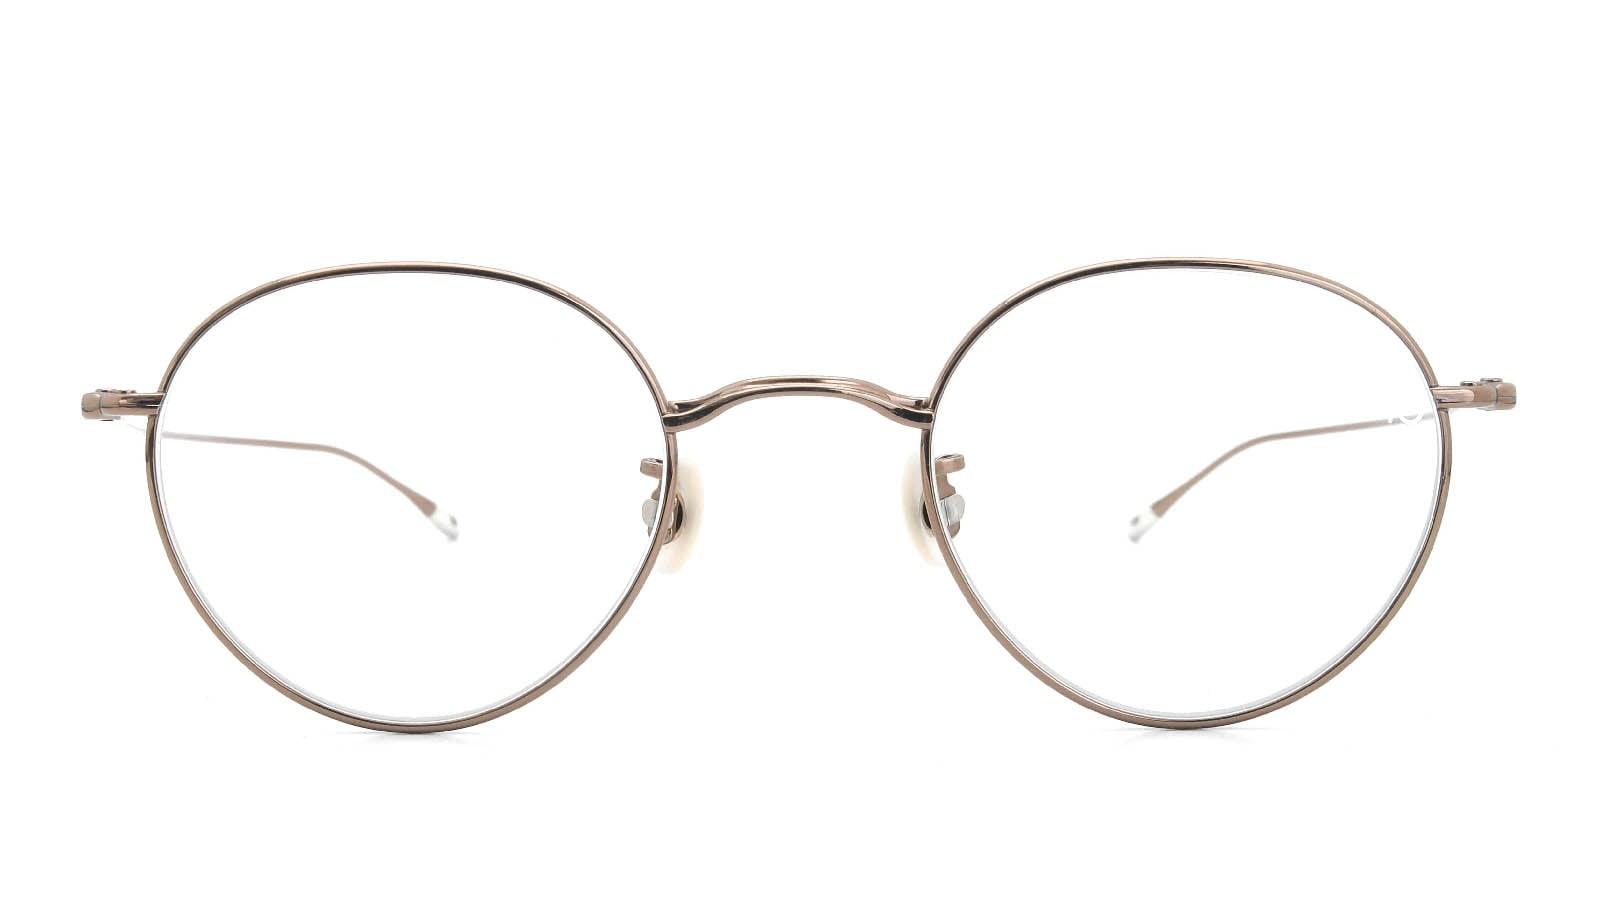 10 eyevan NO.3 47size 9S-CL BrownGold  正面詳細